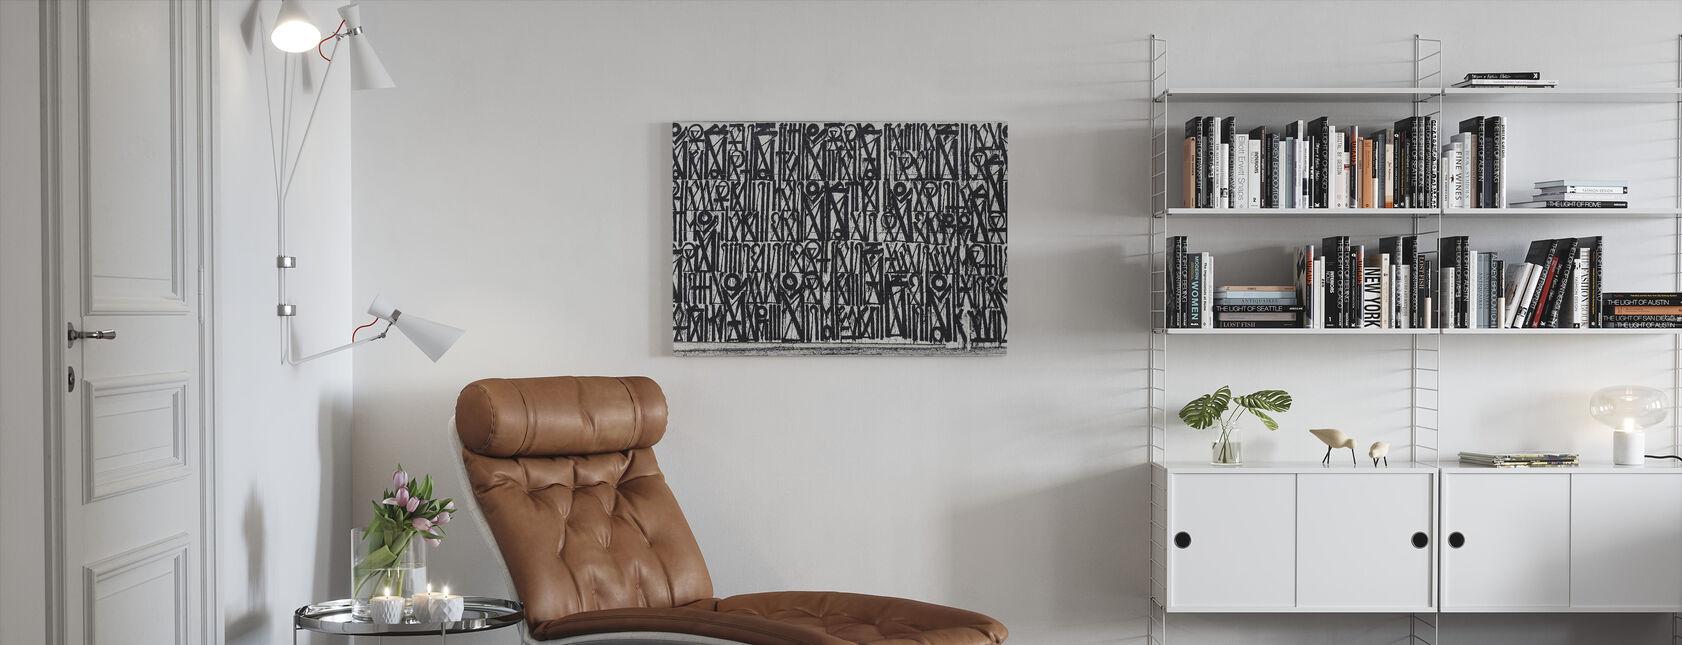 Abstract Graffiti - Canvas print - Living Room